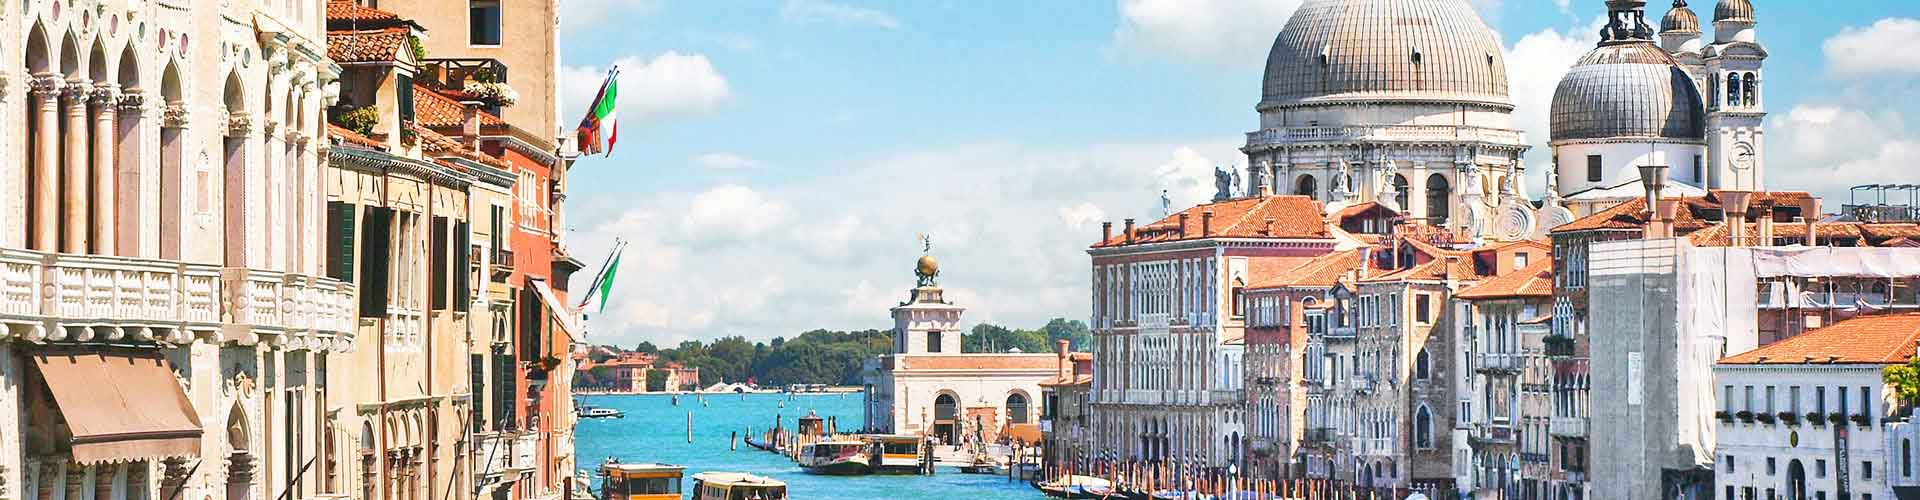 Veneza – Hostels em Veneza. Mapas para Veneza, Fotos e Avaliações para cada Hostels em Veneza.